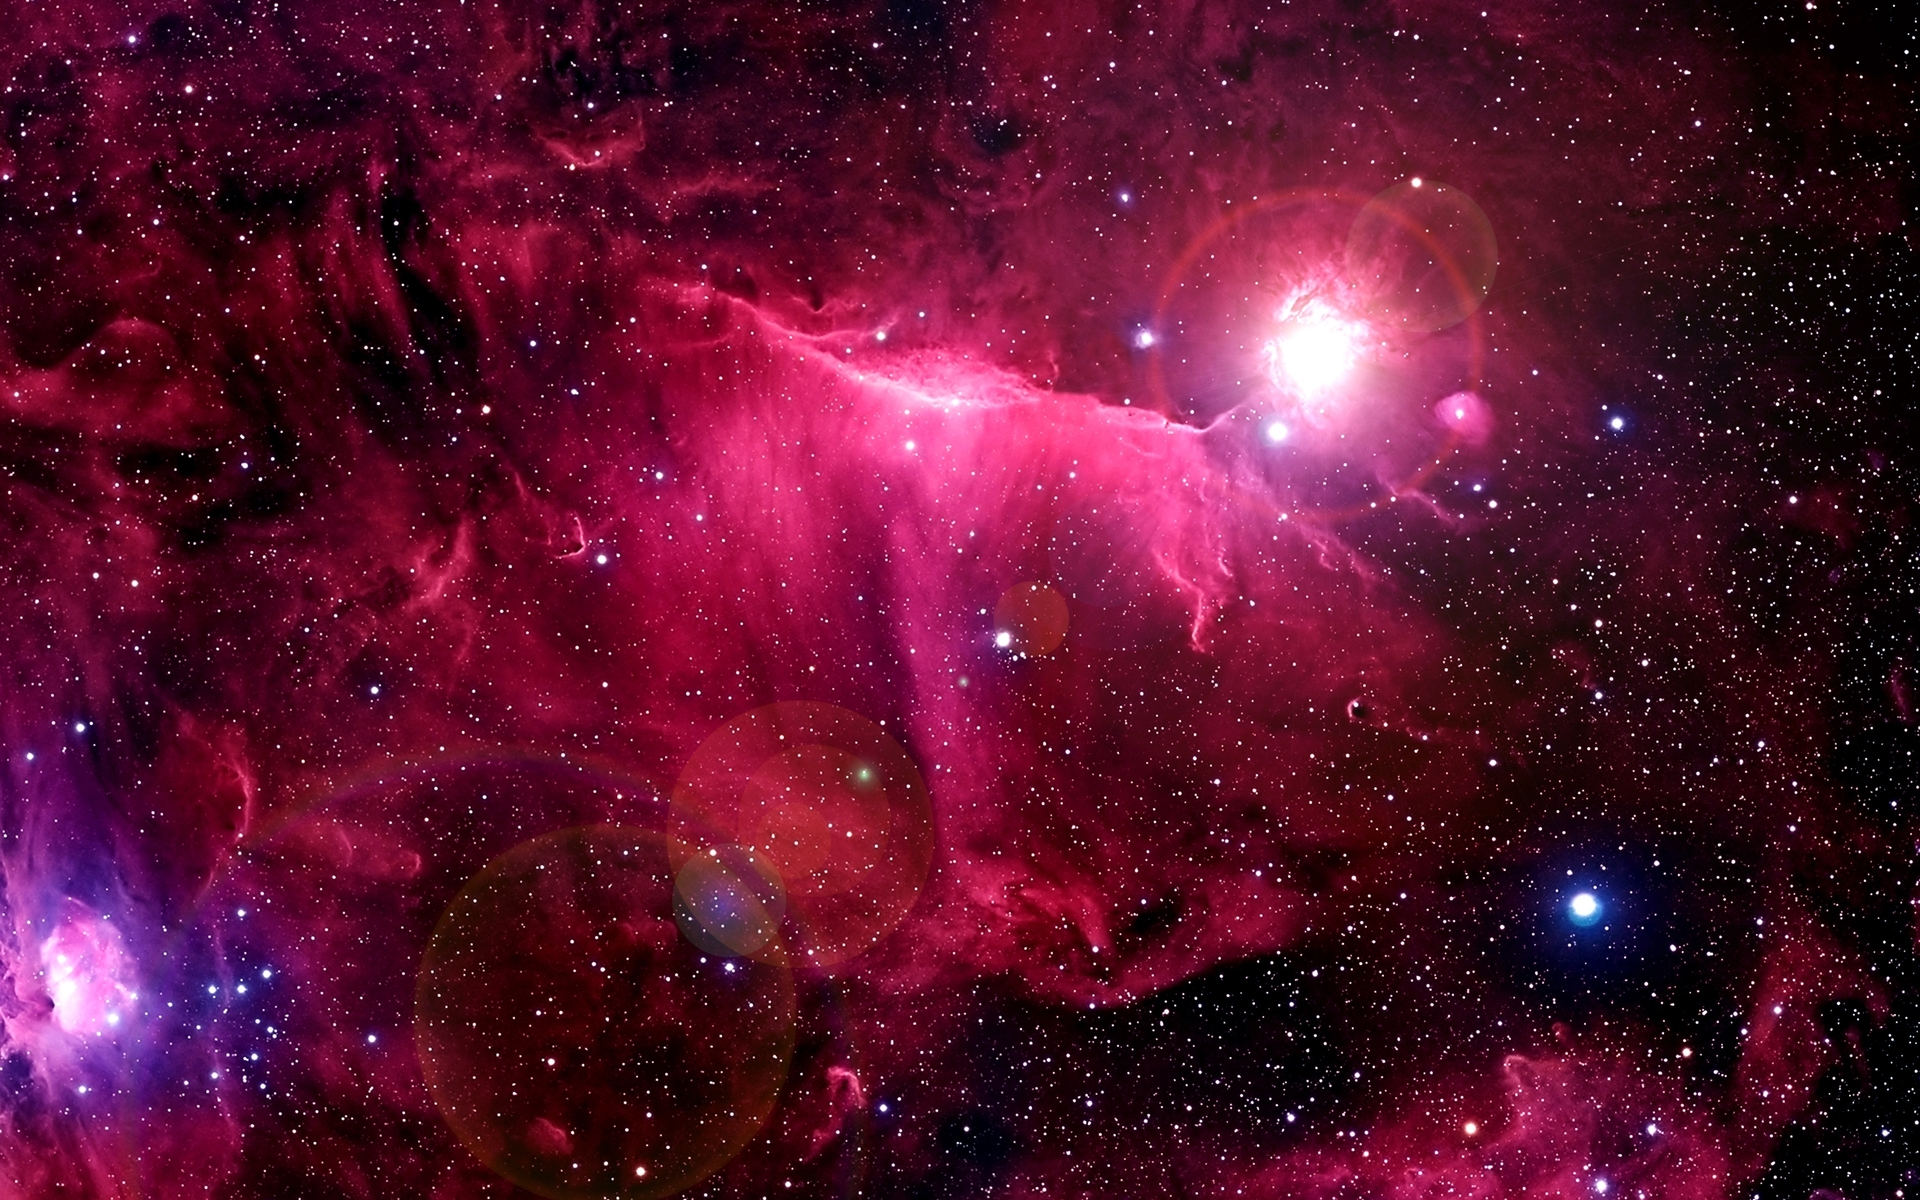 Nebula Computer Wallpapers Desktop Backgrounds 1920x1200